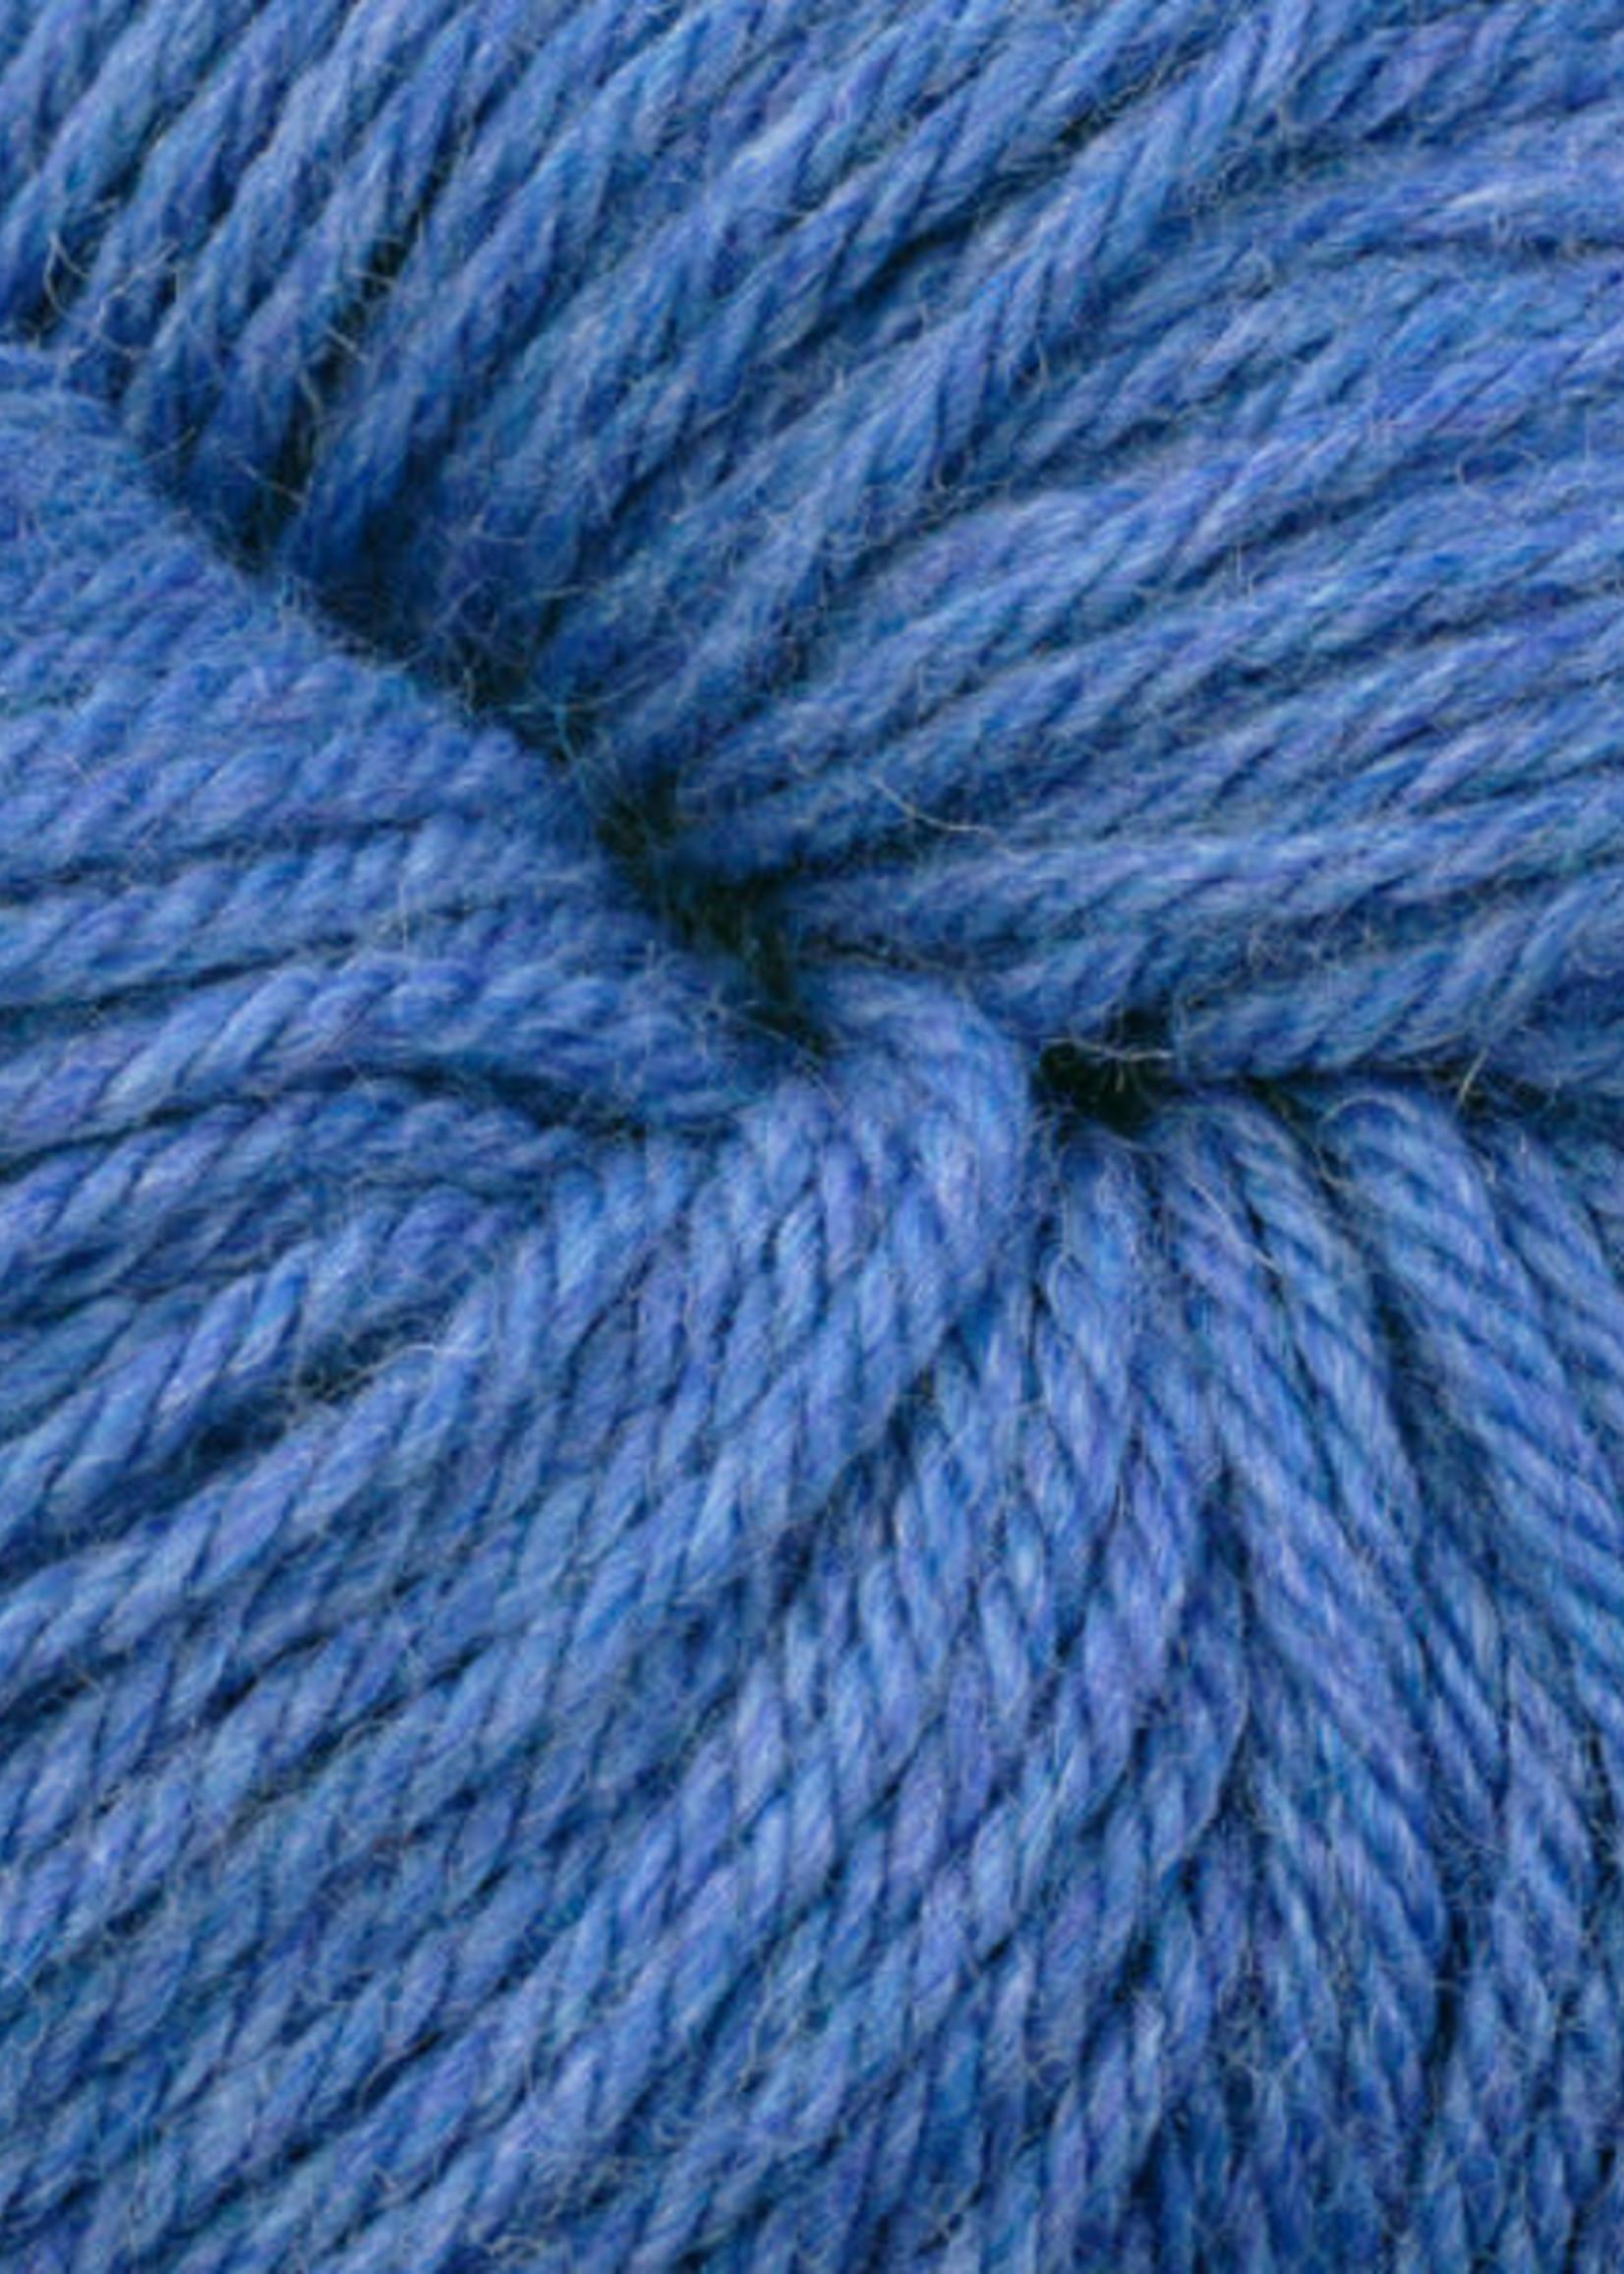 Berroco Berroco Vintage Yarn #5170 Sapphire